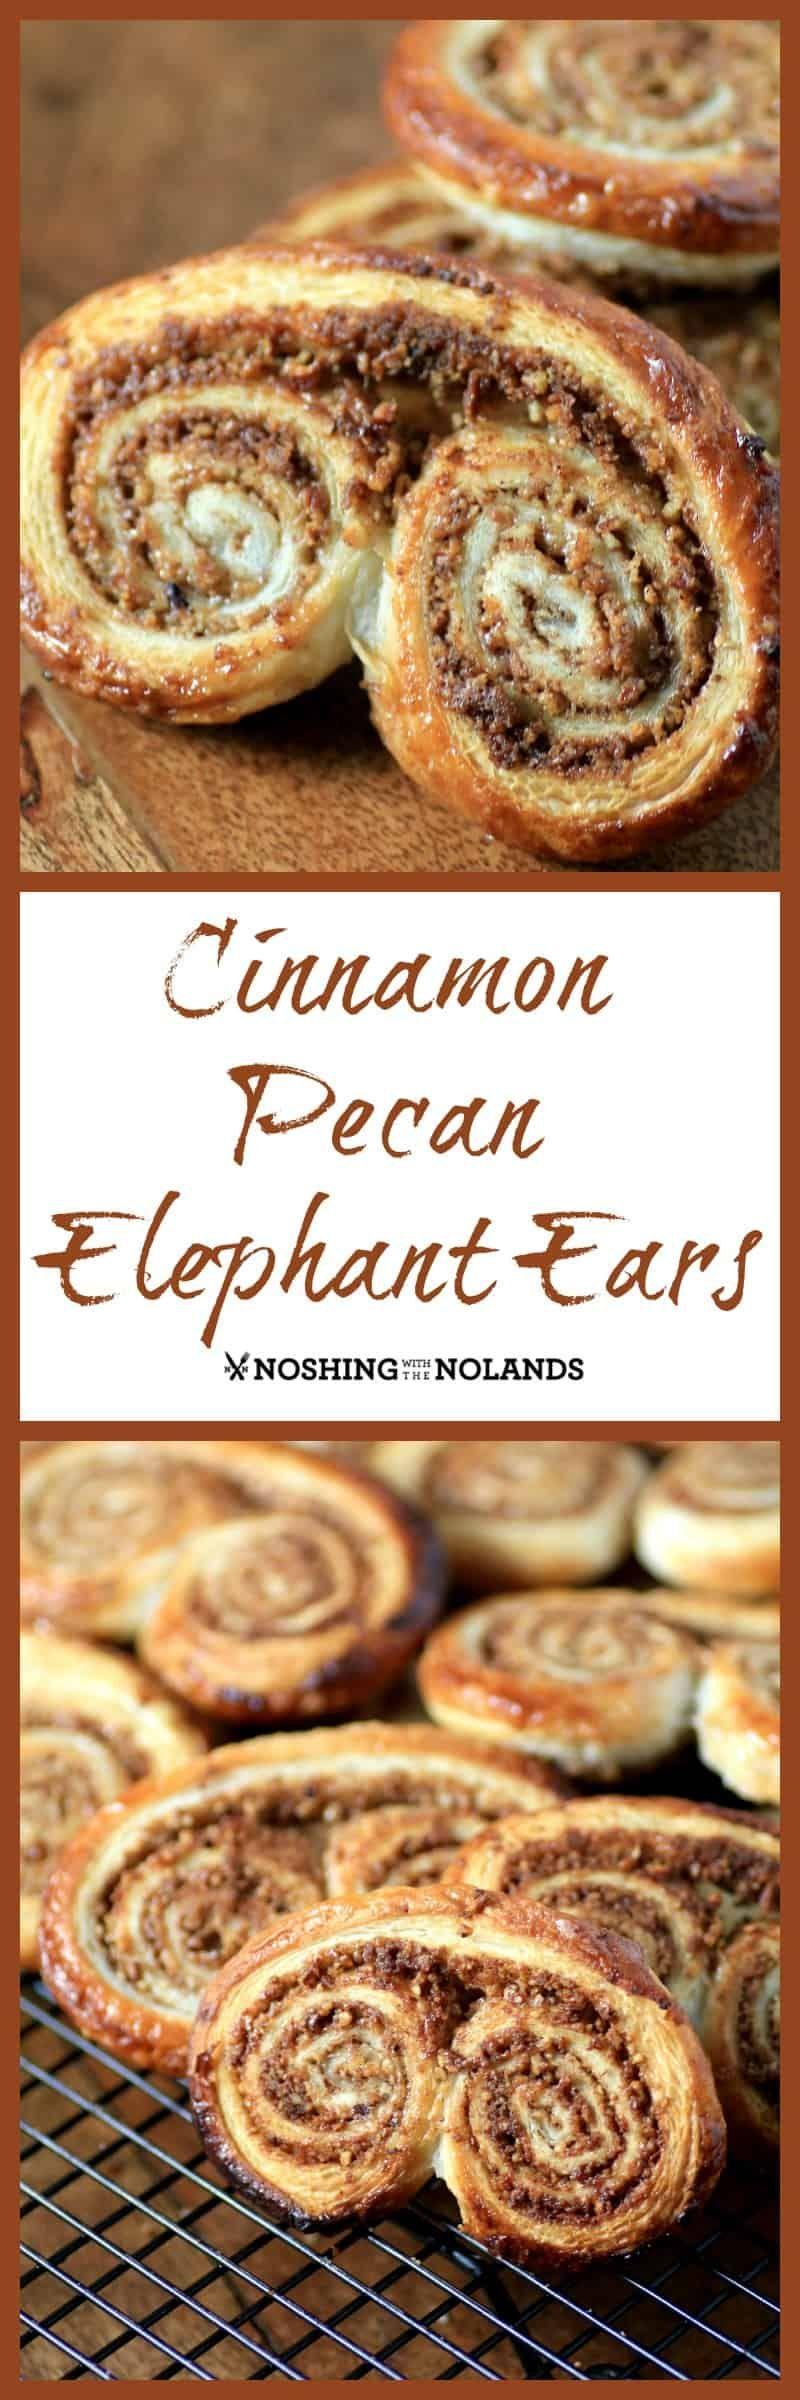 Cinnamon Pecan Elephant Ears #CreativeCookieExchange